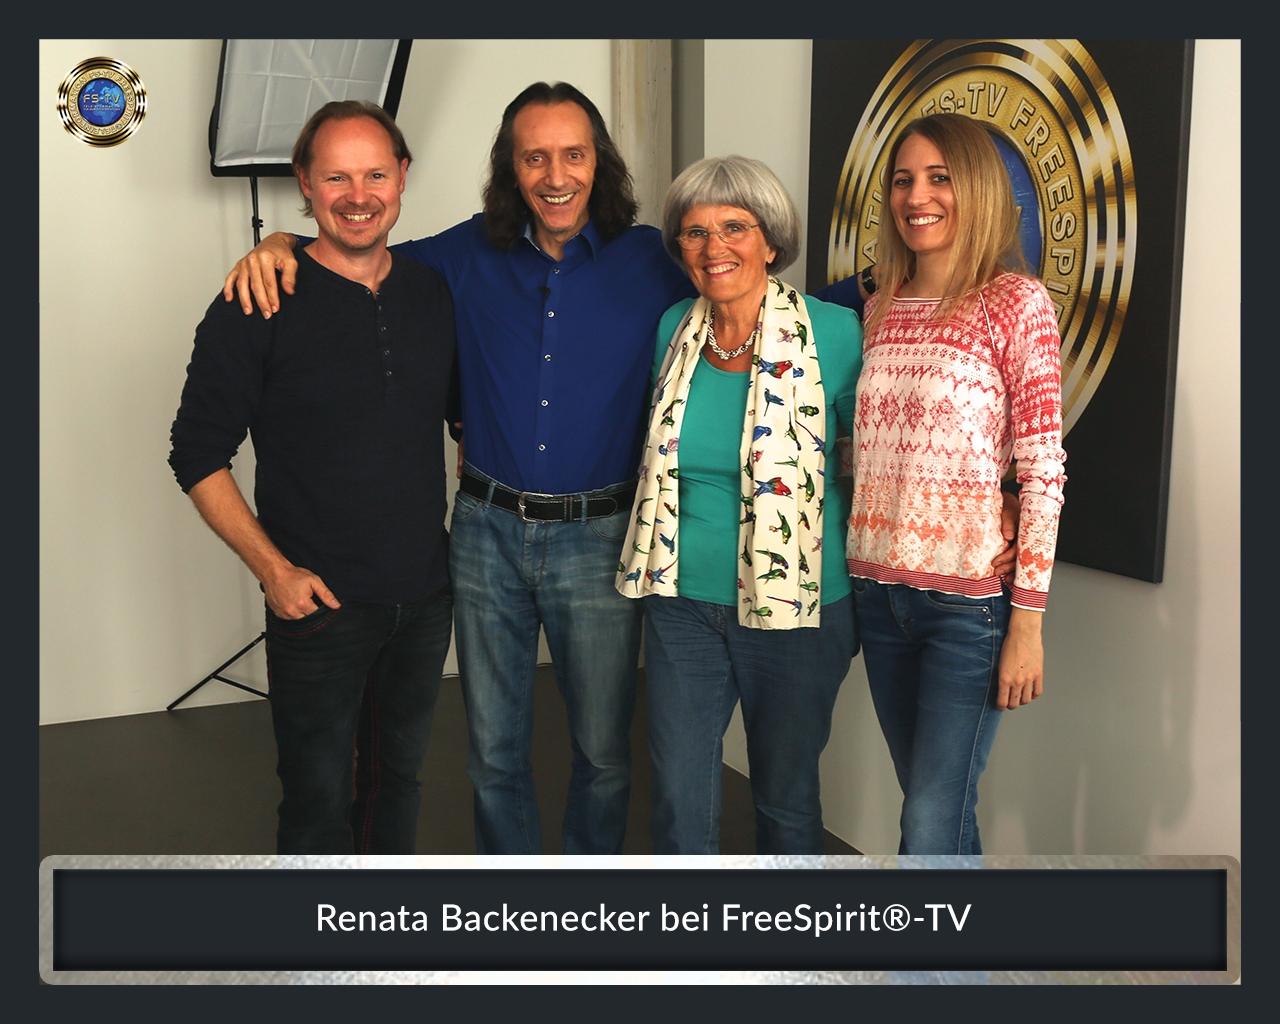 FS-TV-Bildergallerie-Renata-Backenecker-1